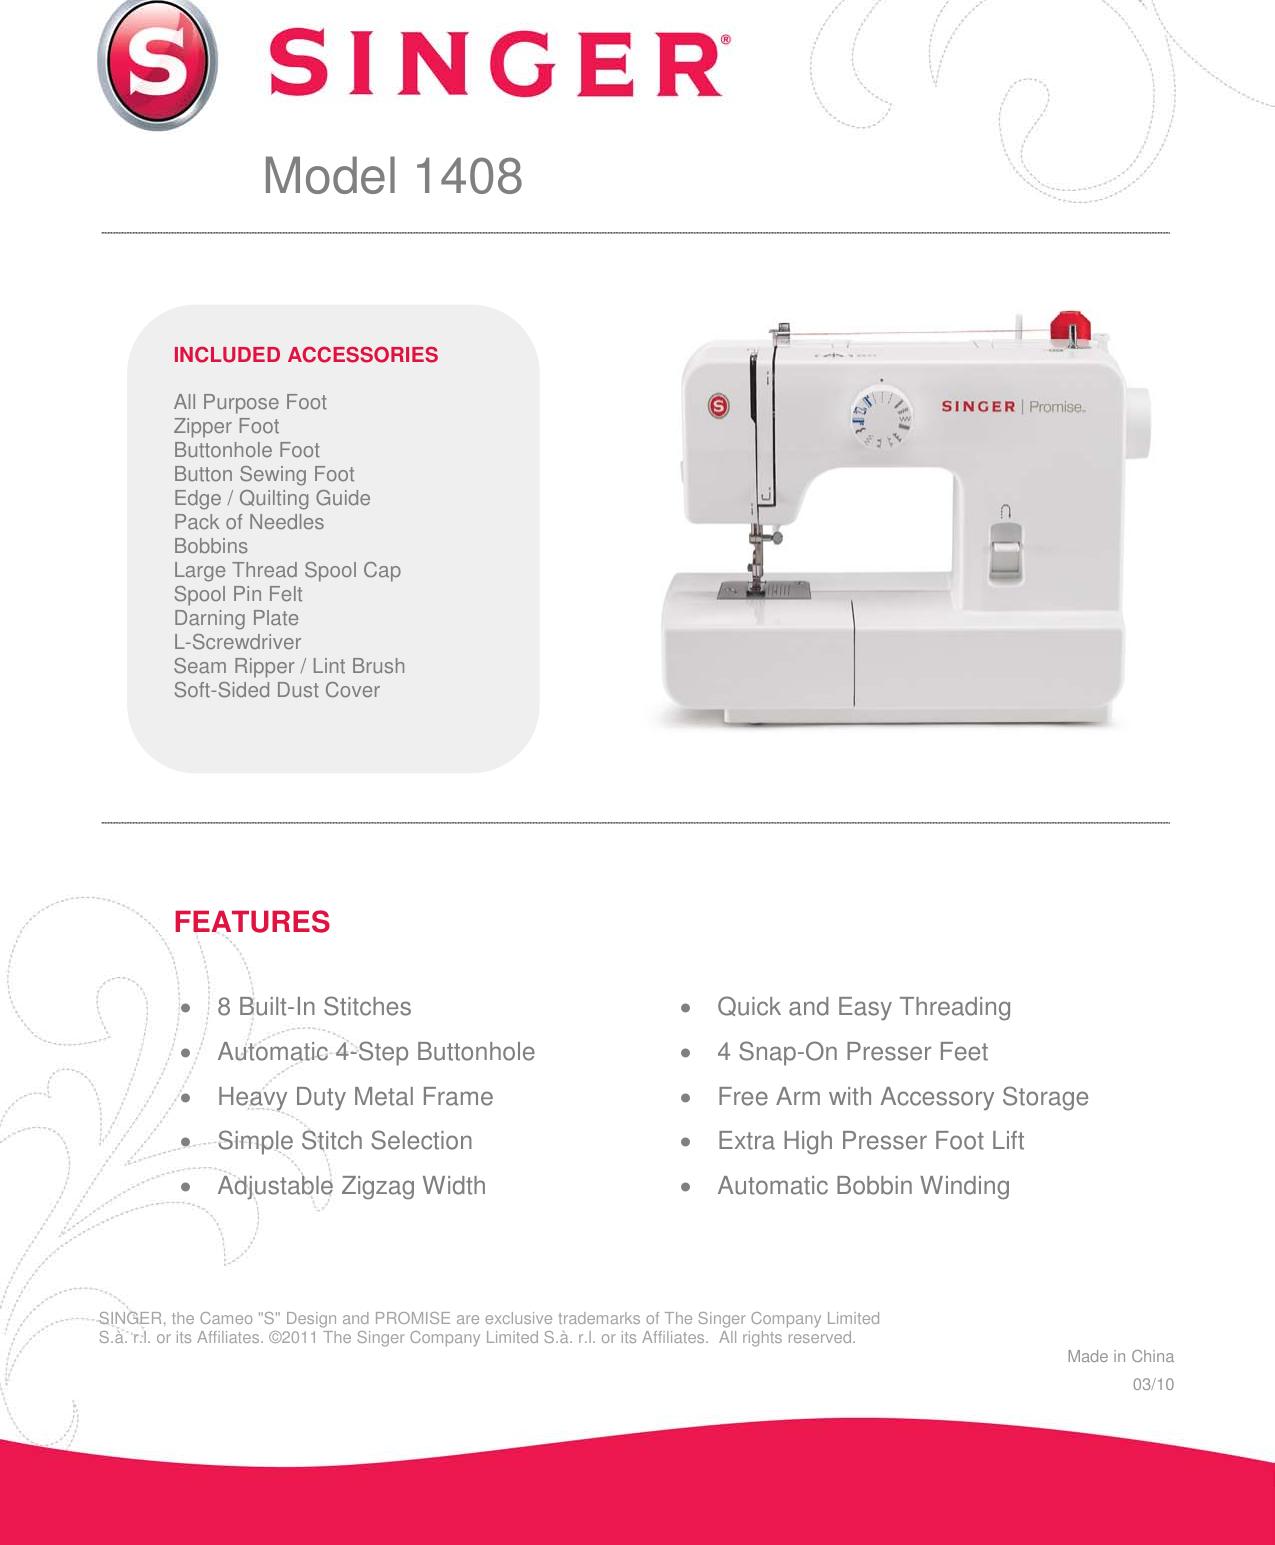 Singer 1408 Promise Product Sheet